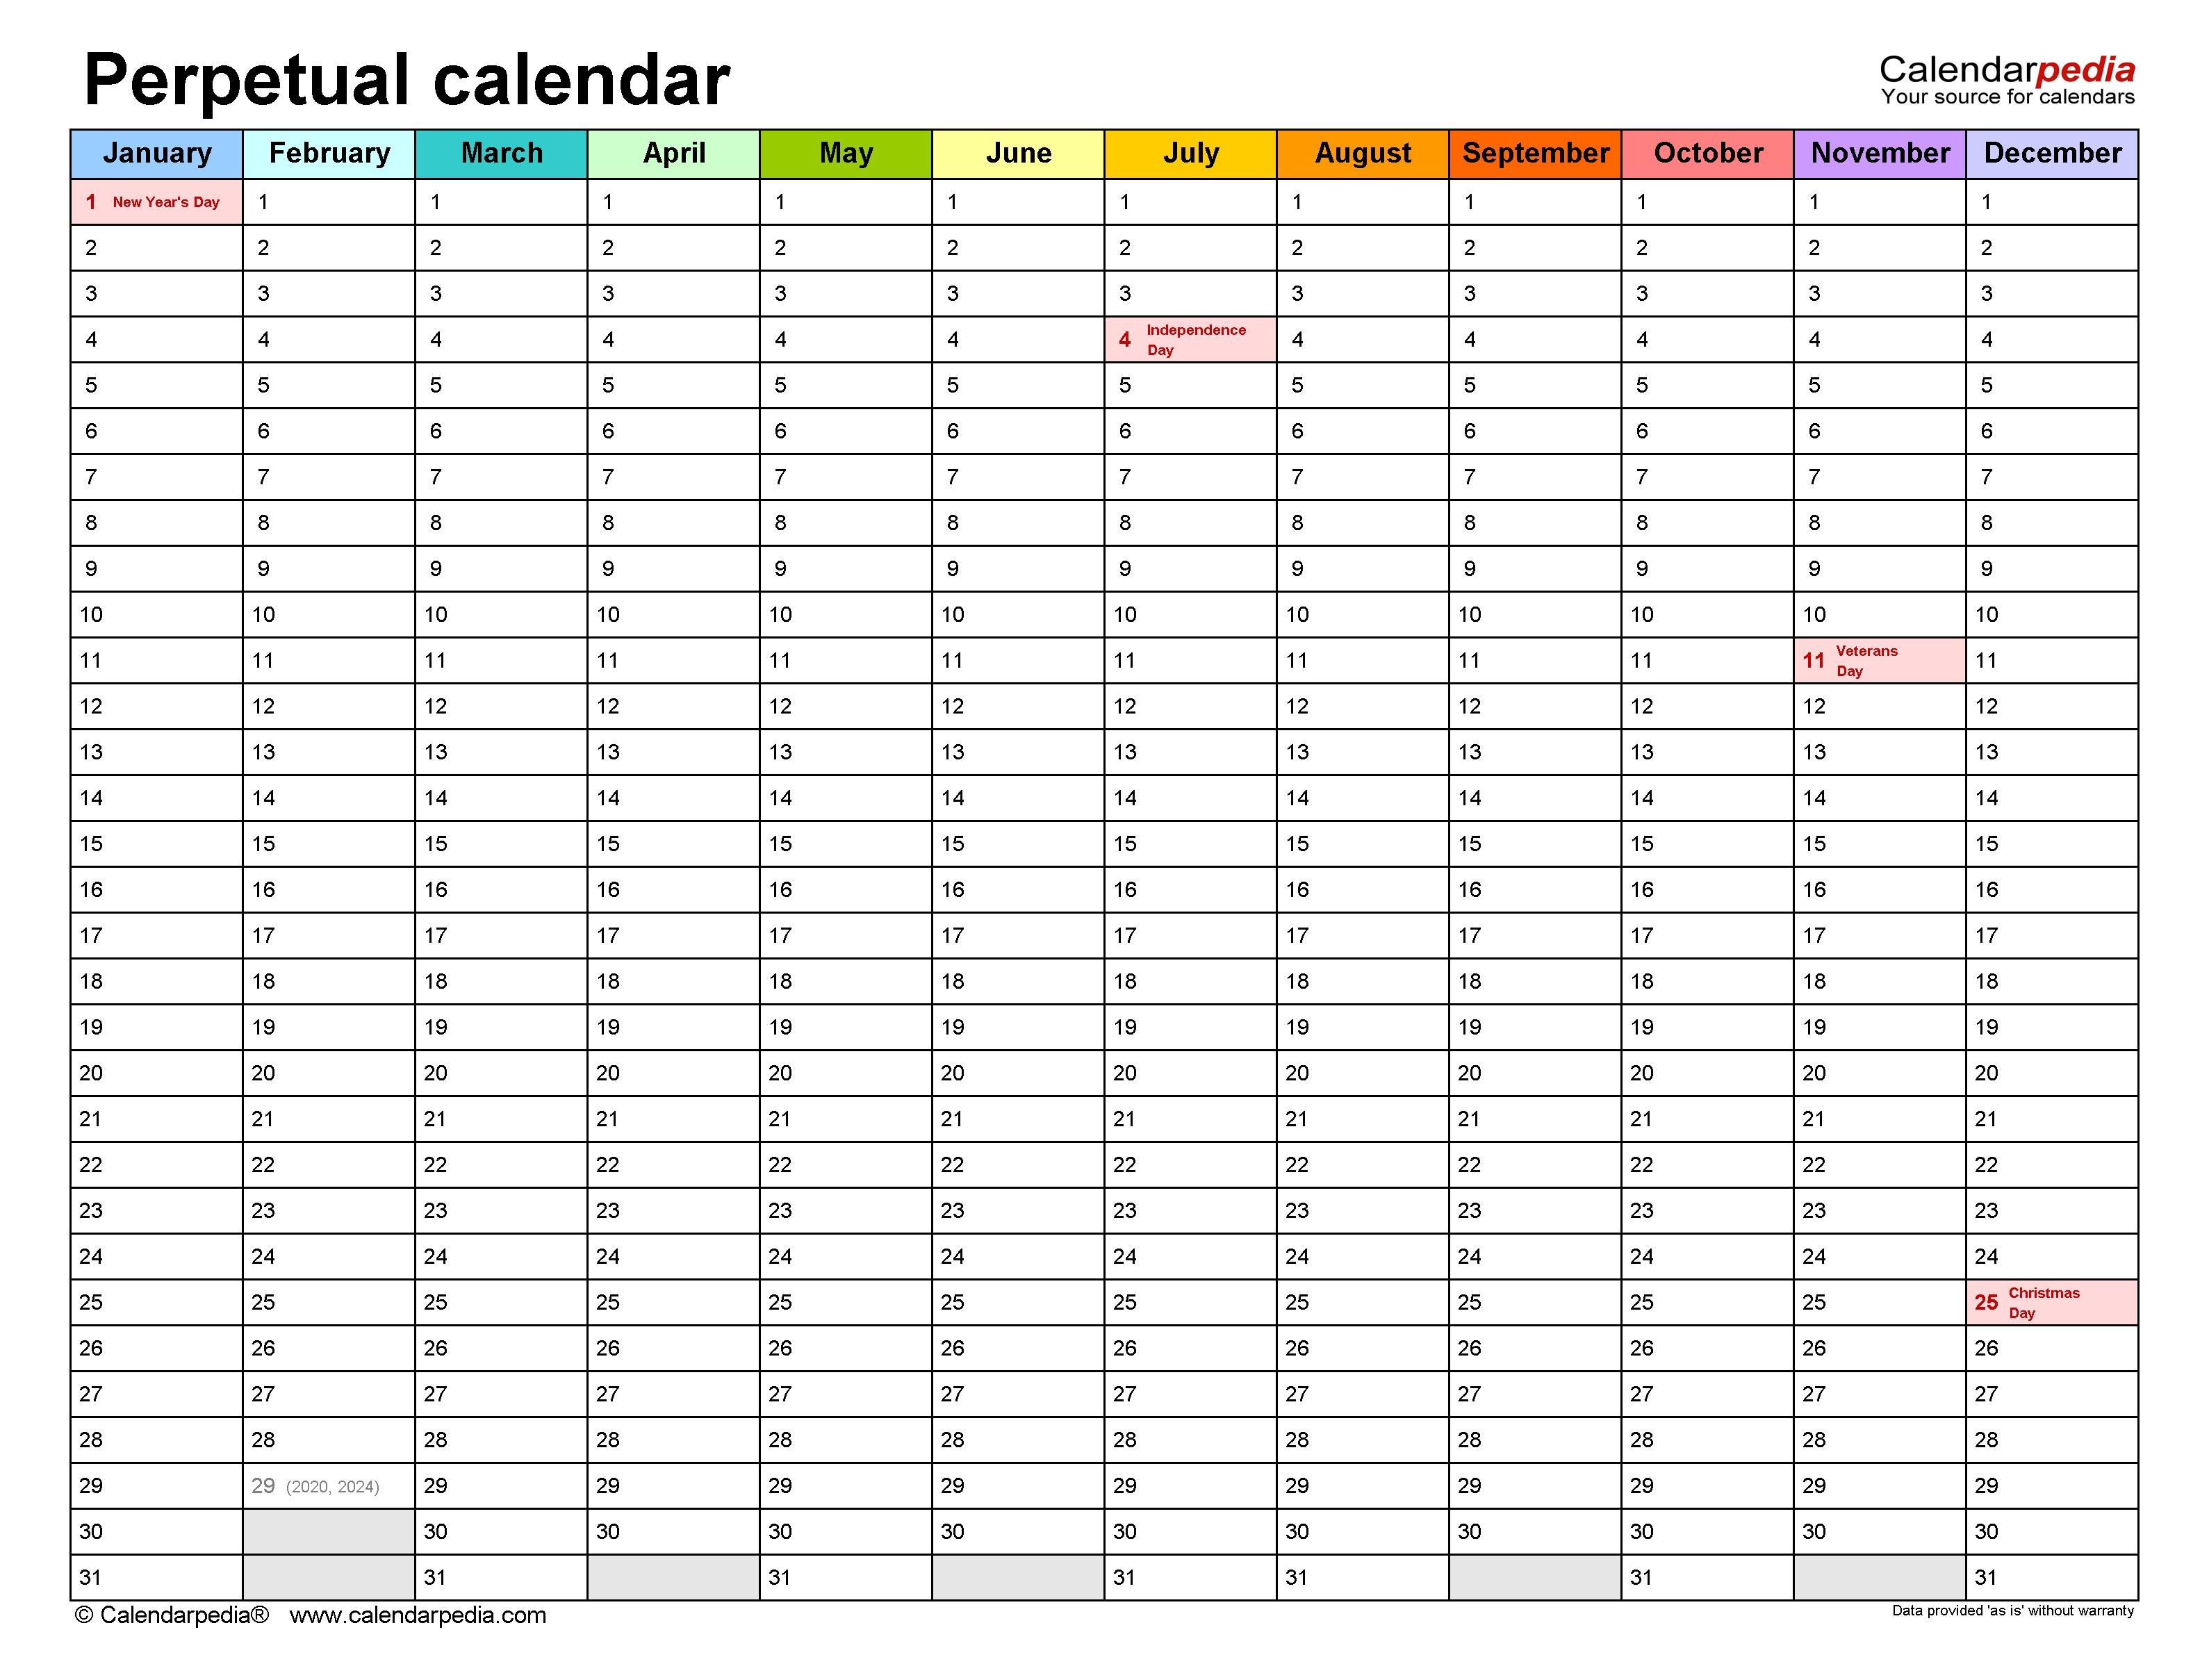 Perpetual Calendars - Free Printable Microsoft Excel Templates